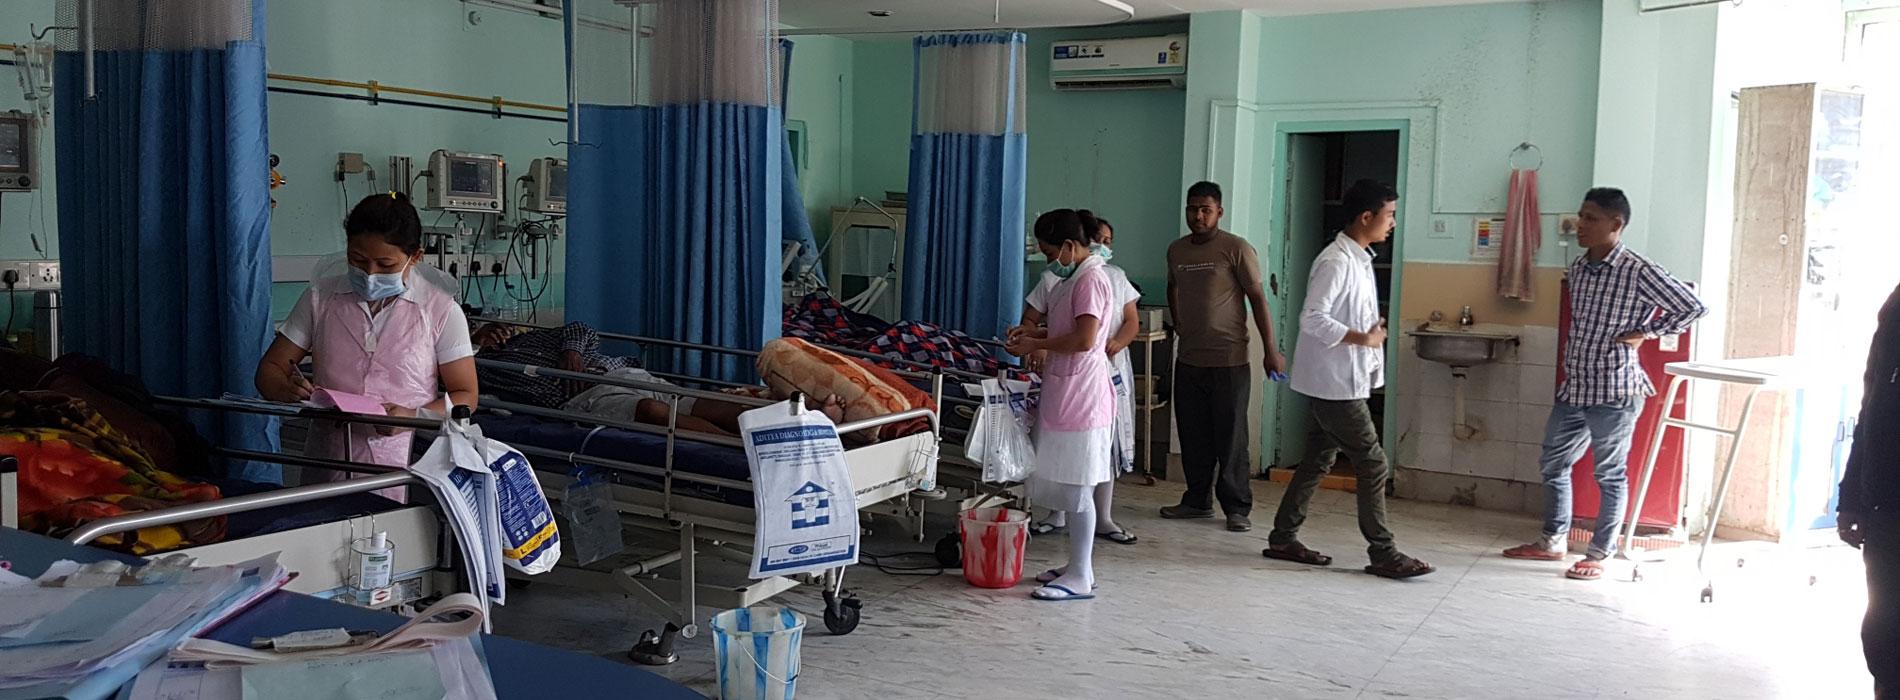 adityahospitals-slider-05